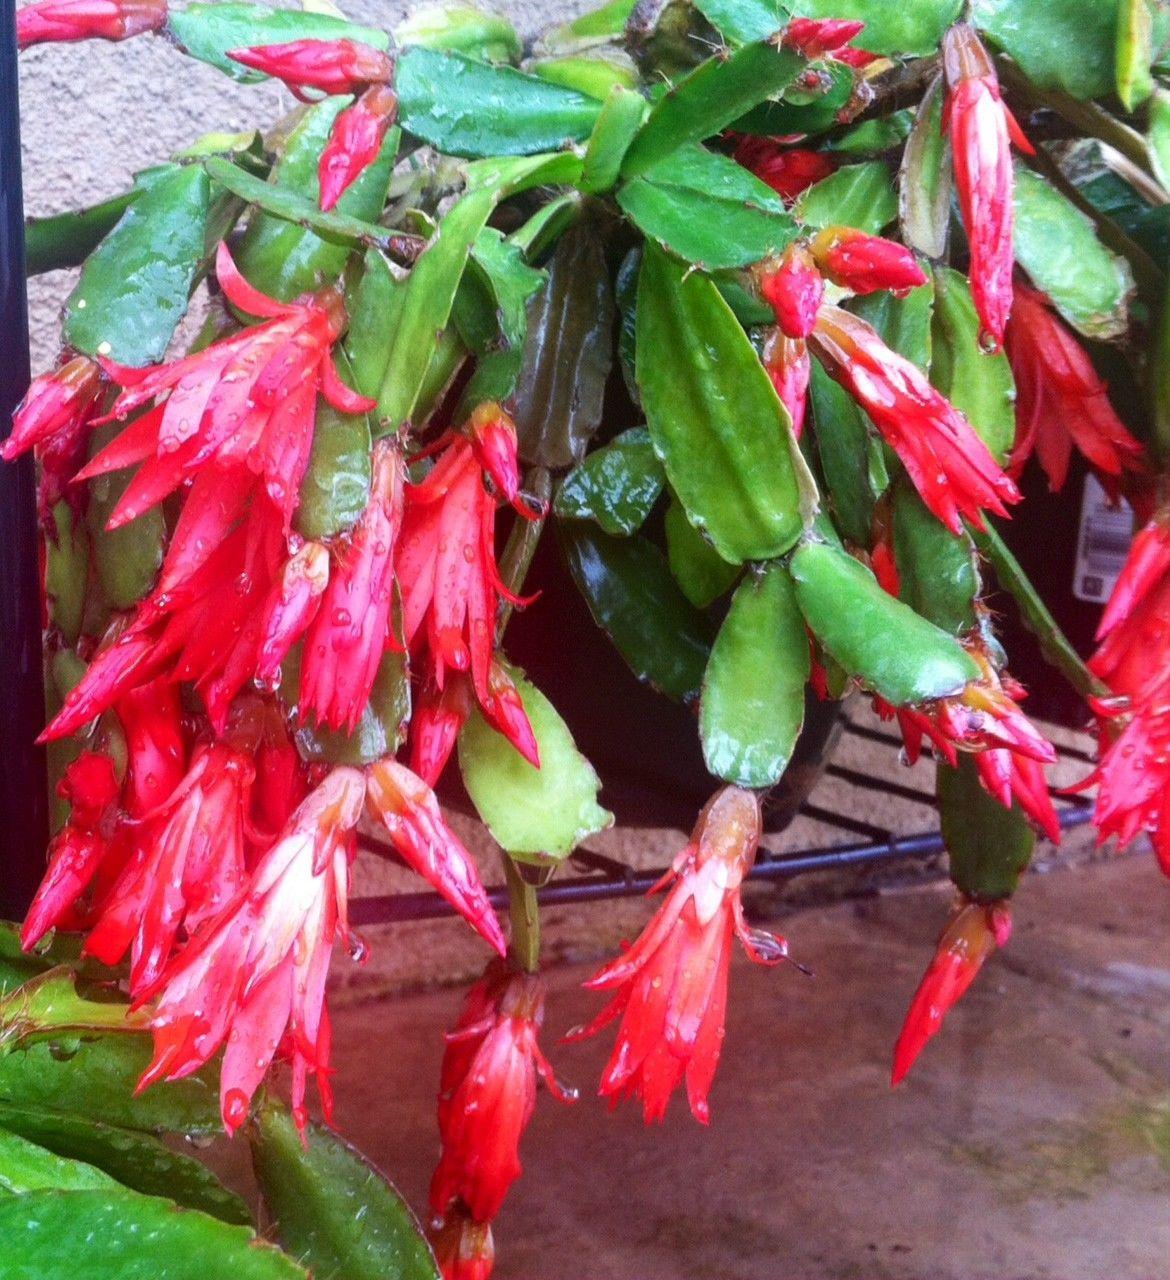 easter cactus cuttings heaving blooming deep red easter cactus